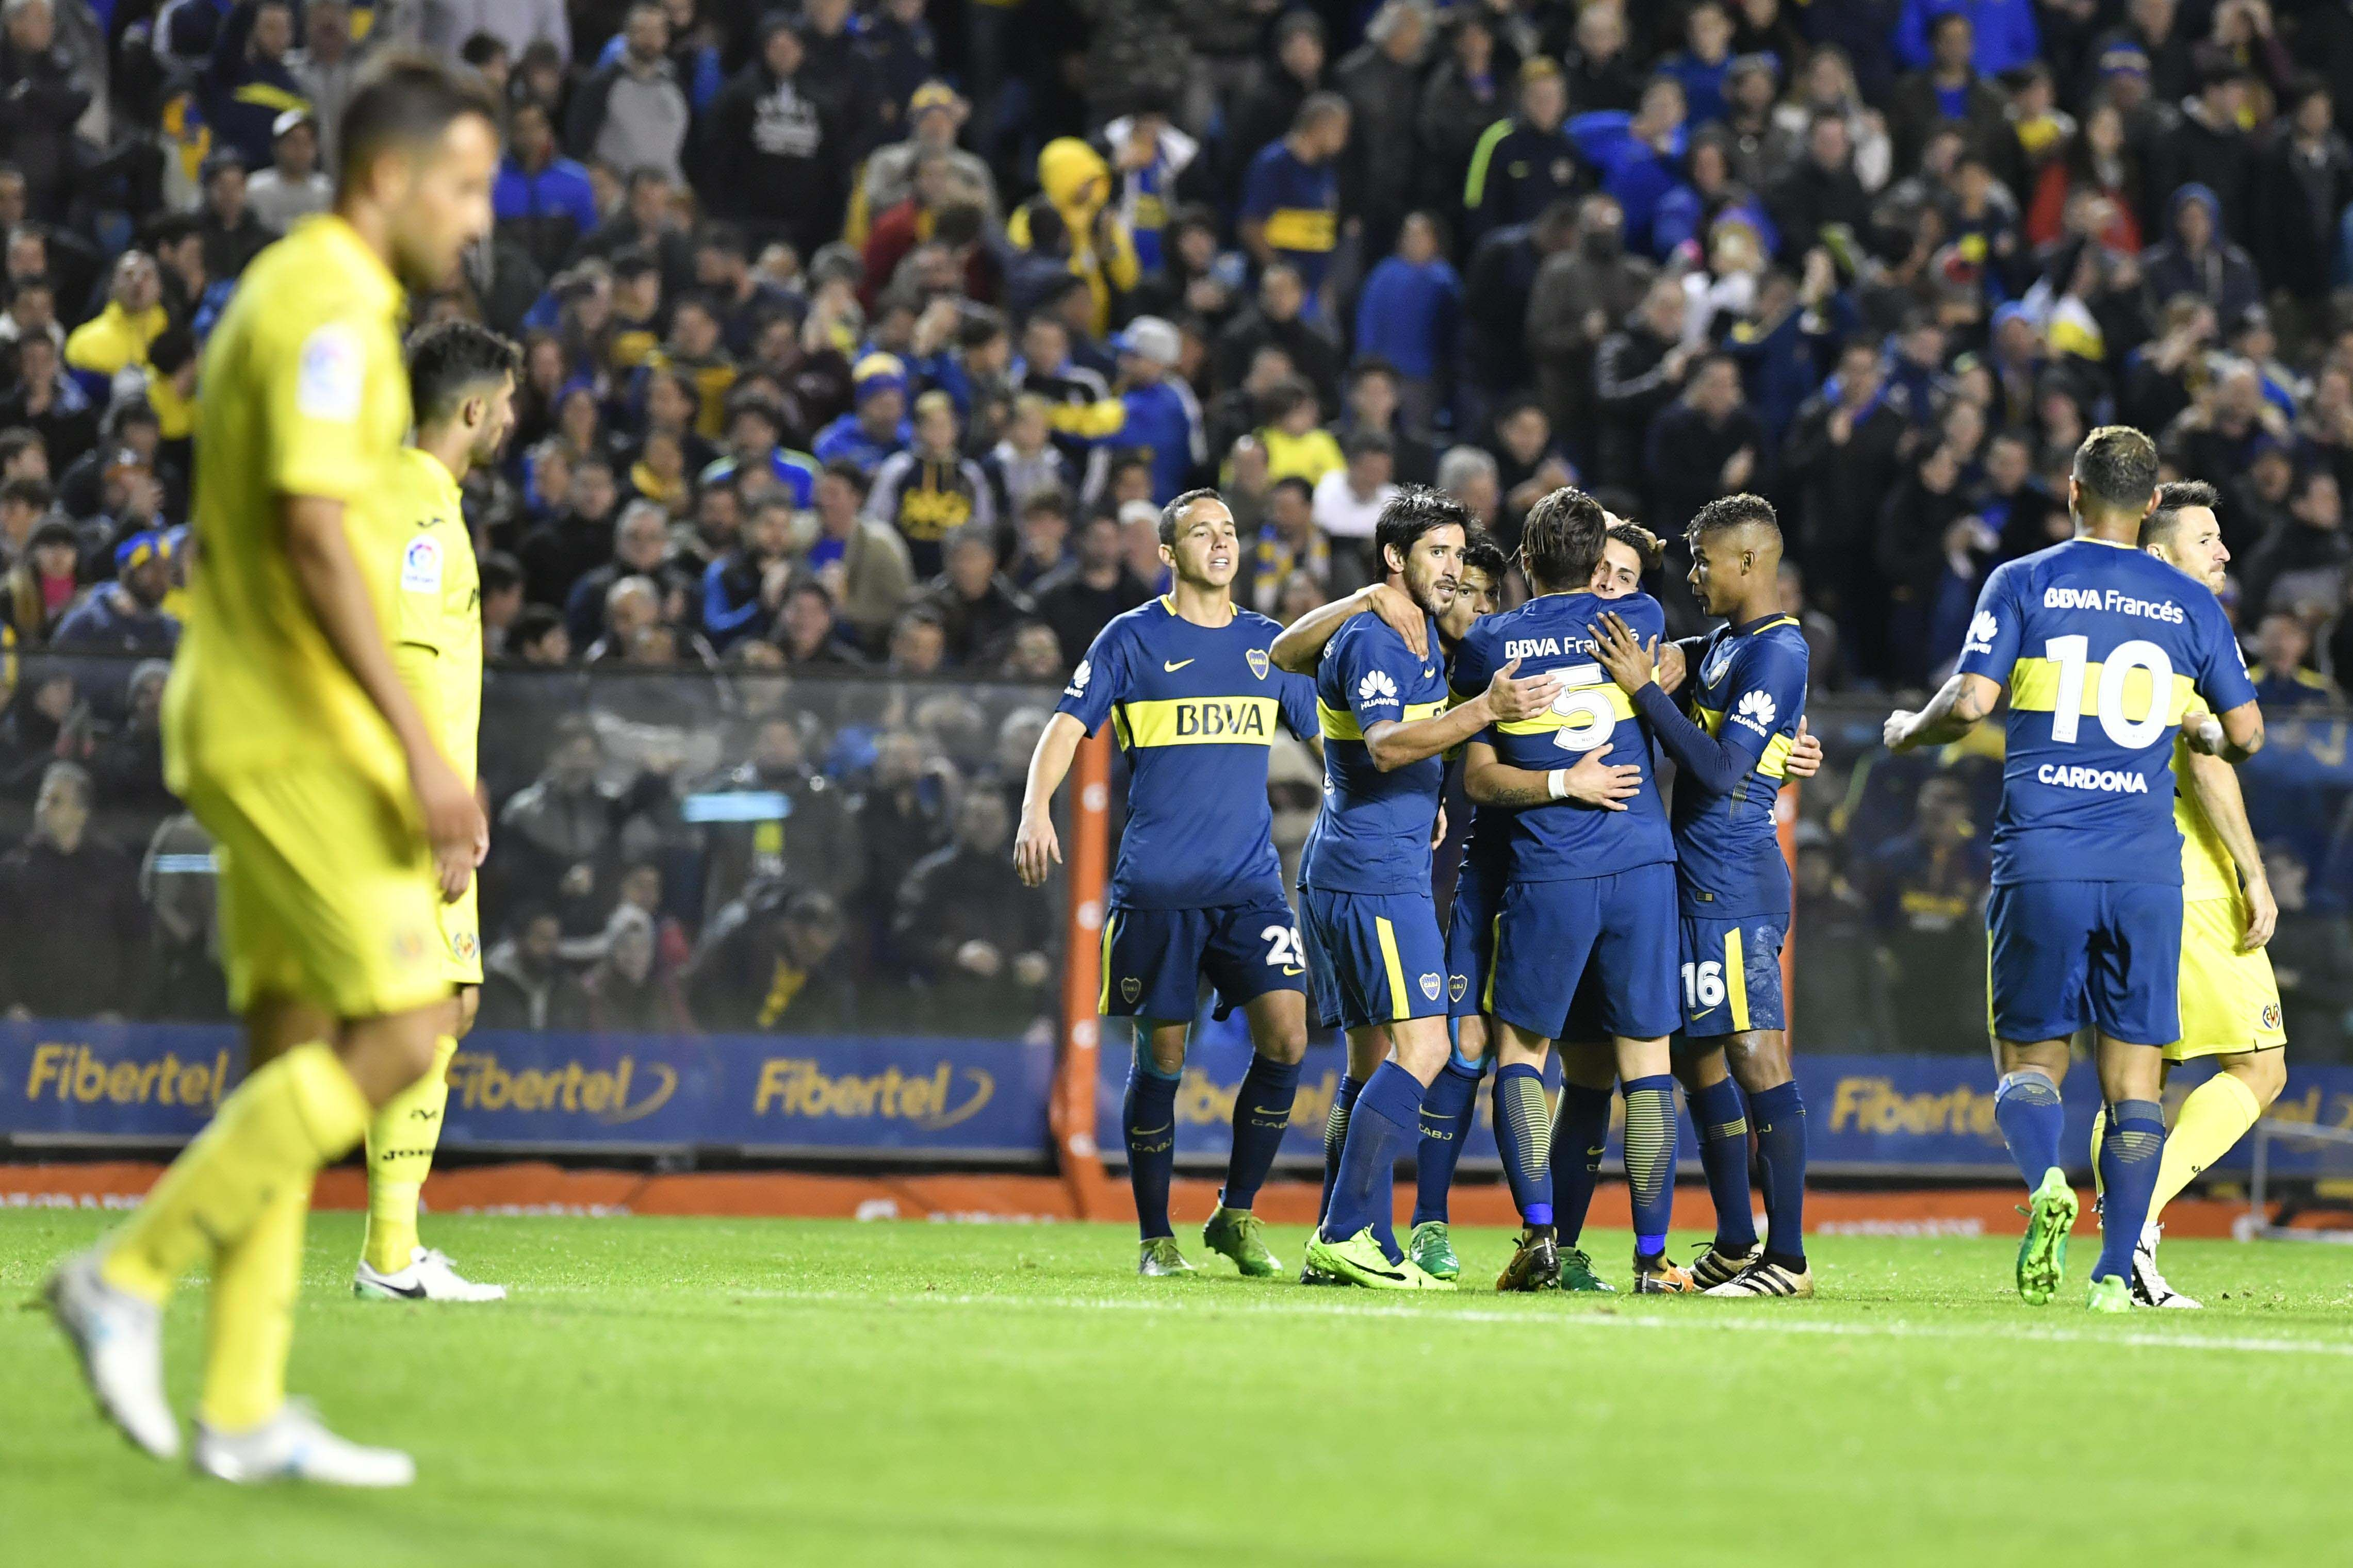 Boca derrotó a Villarreal de España en el amistoso en la Bombonera